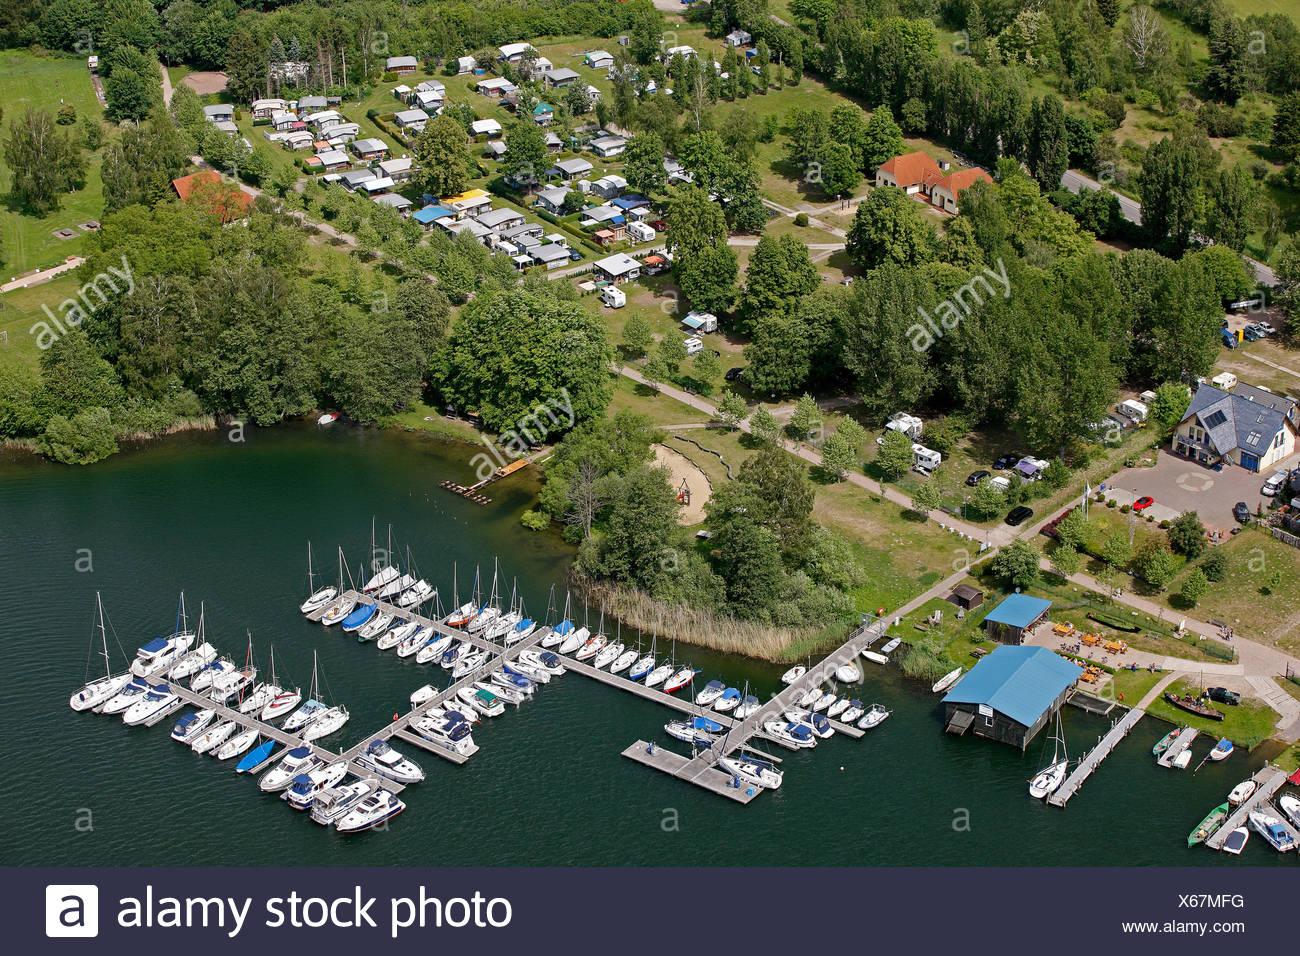 Aerial view, piers, sailing ships, Roebel, Mueritz, Mecklenburg-Western Pomerania, Germany, Europe - Stock Image